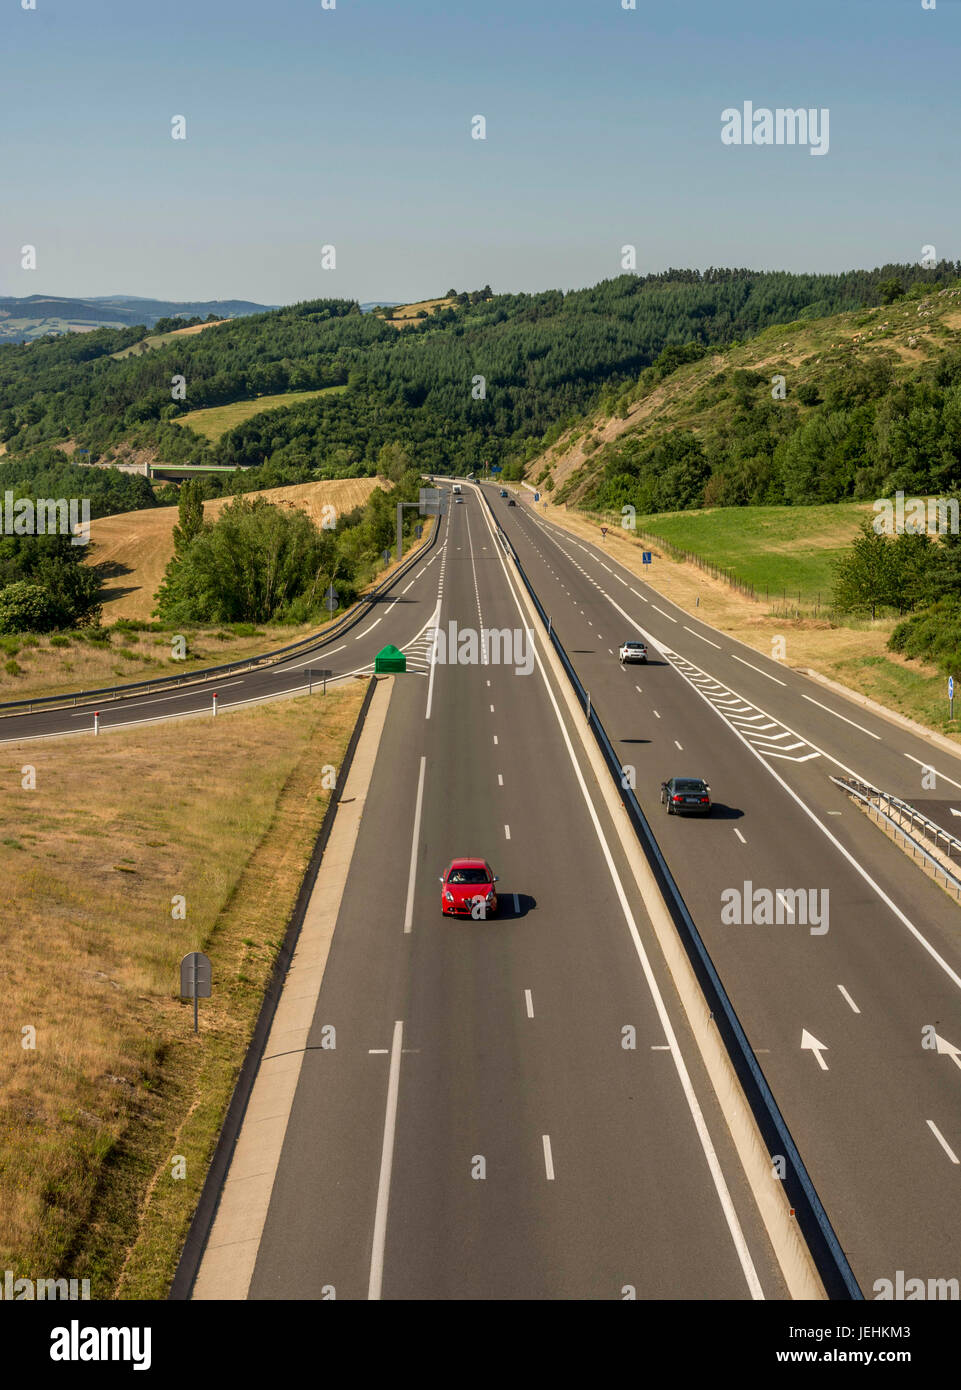 A75 Motorway Near Marvejols Village Lozere Occitanie France Europe